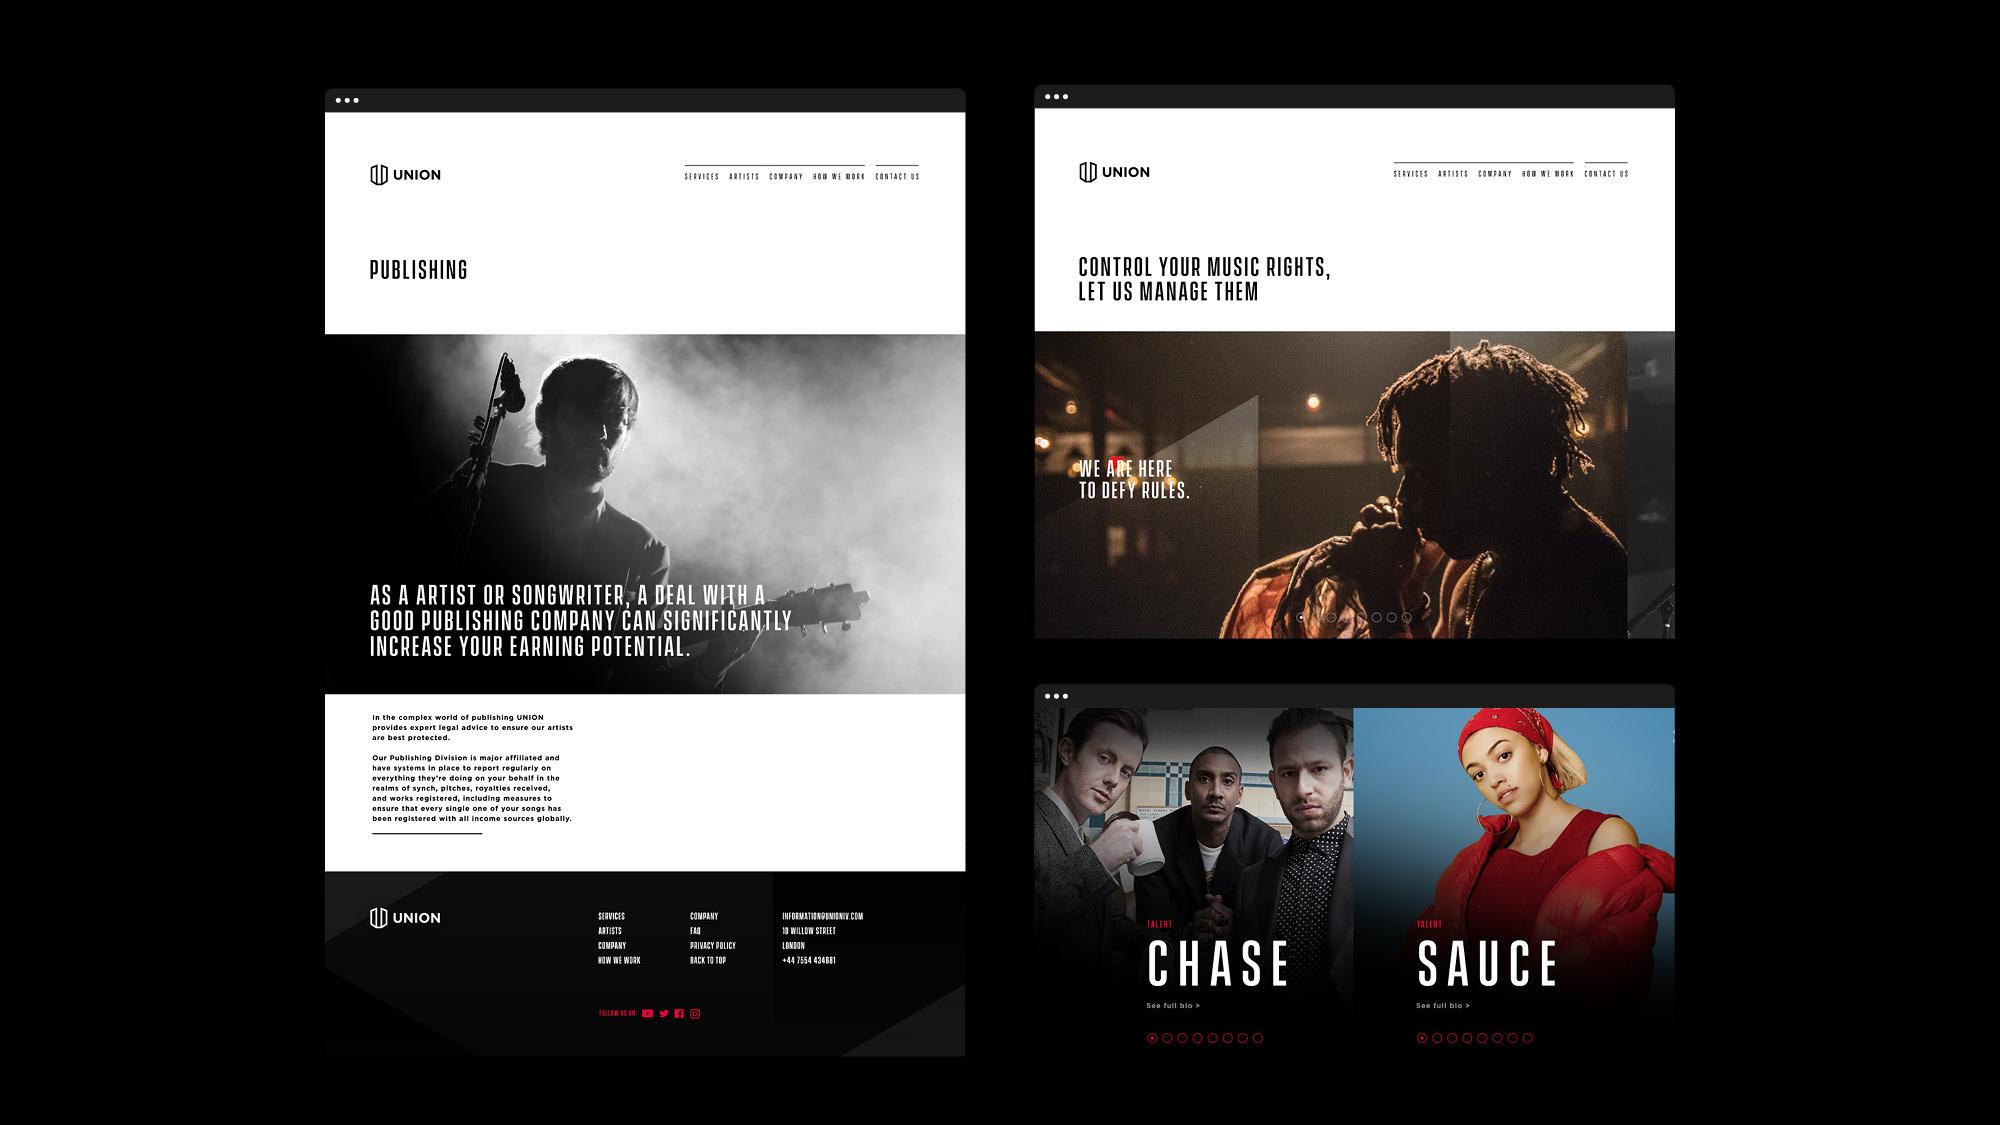 Nacione-Branding-Union-IV-Music8